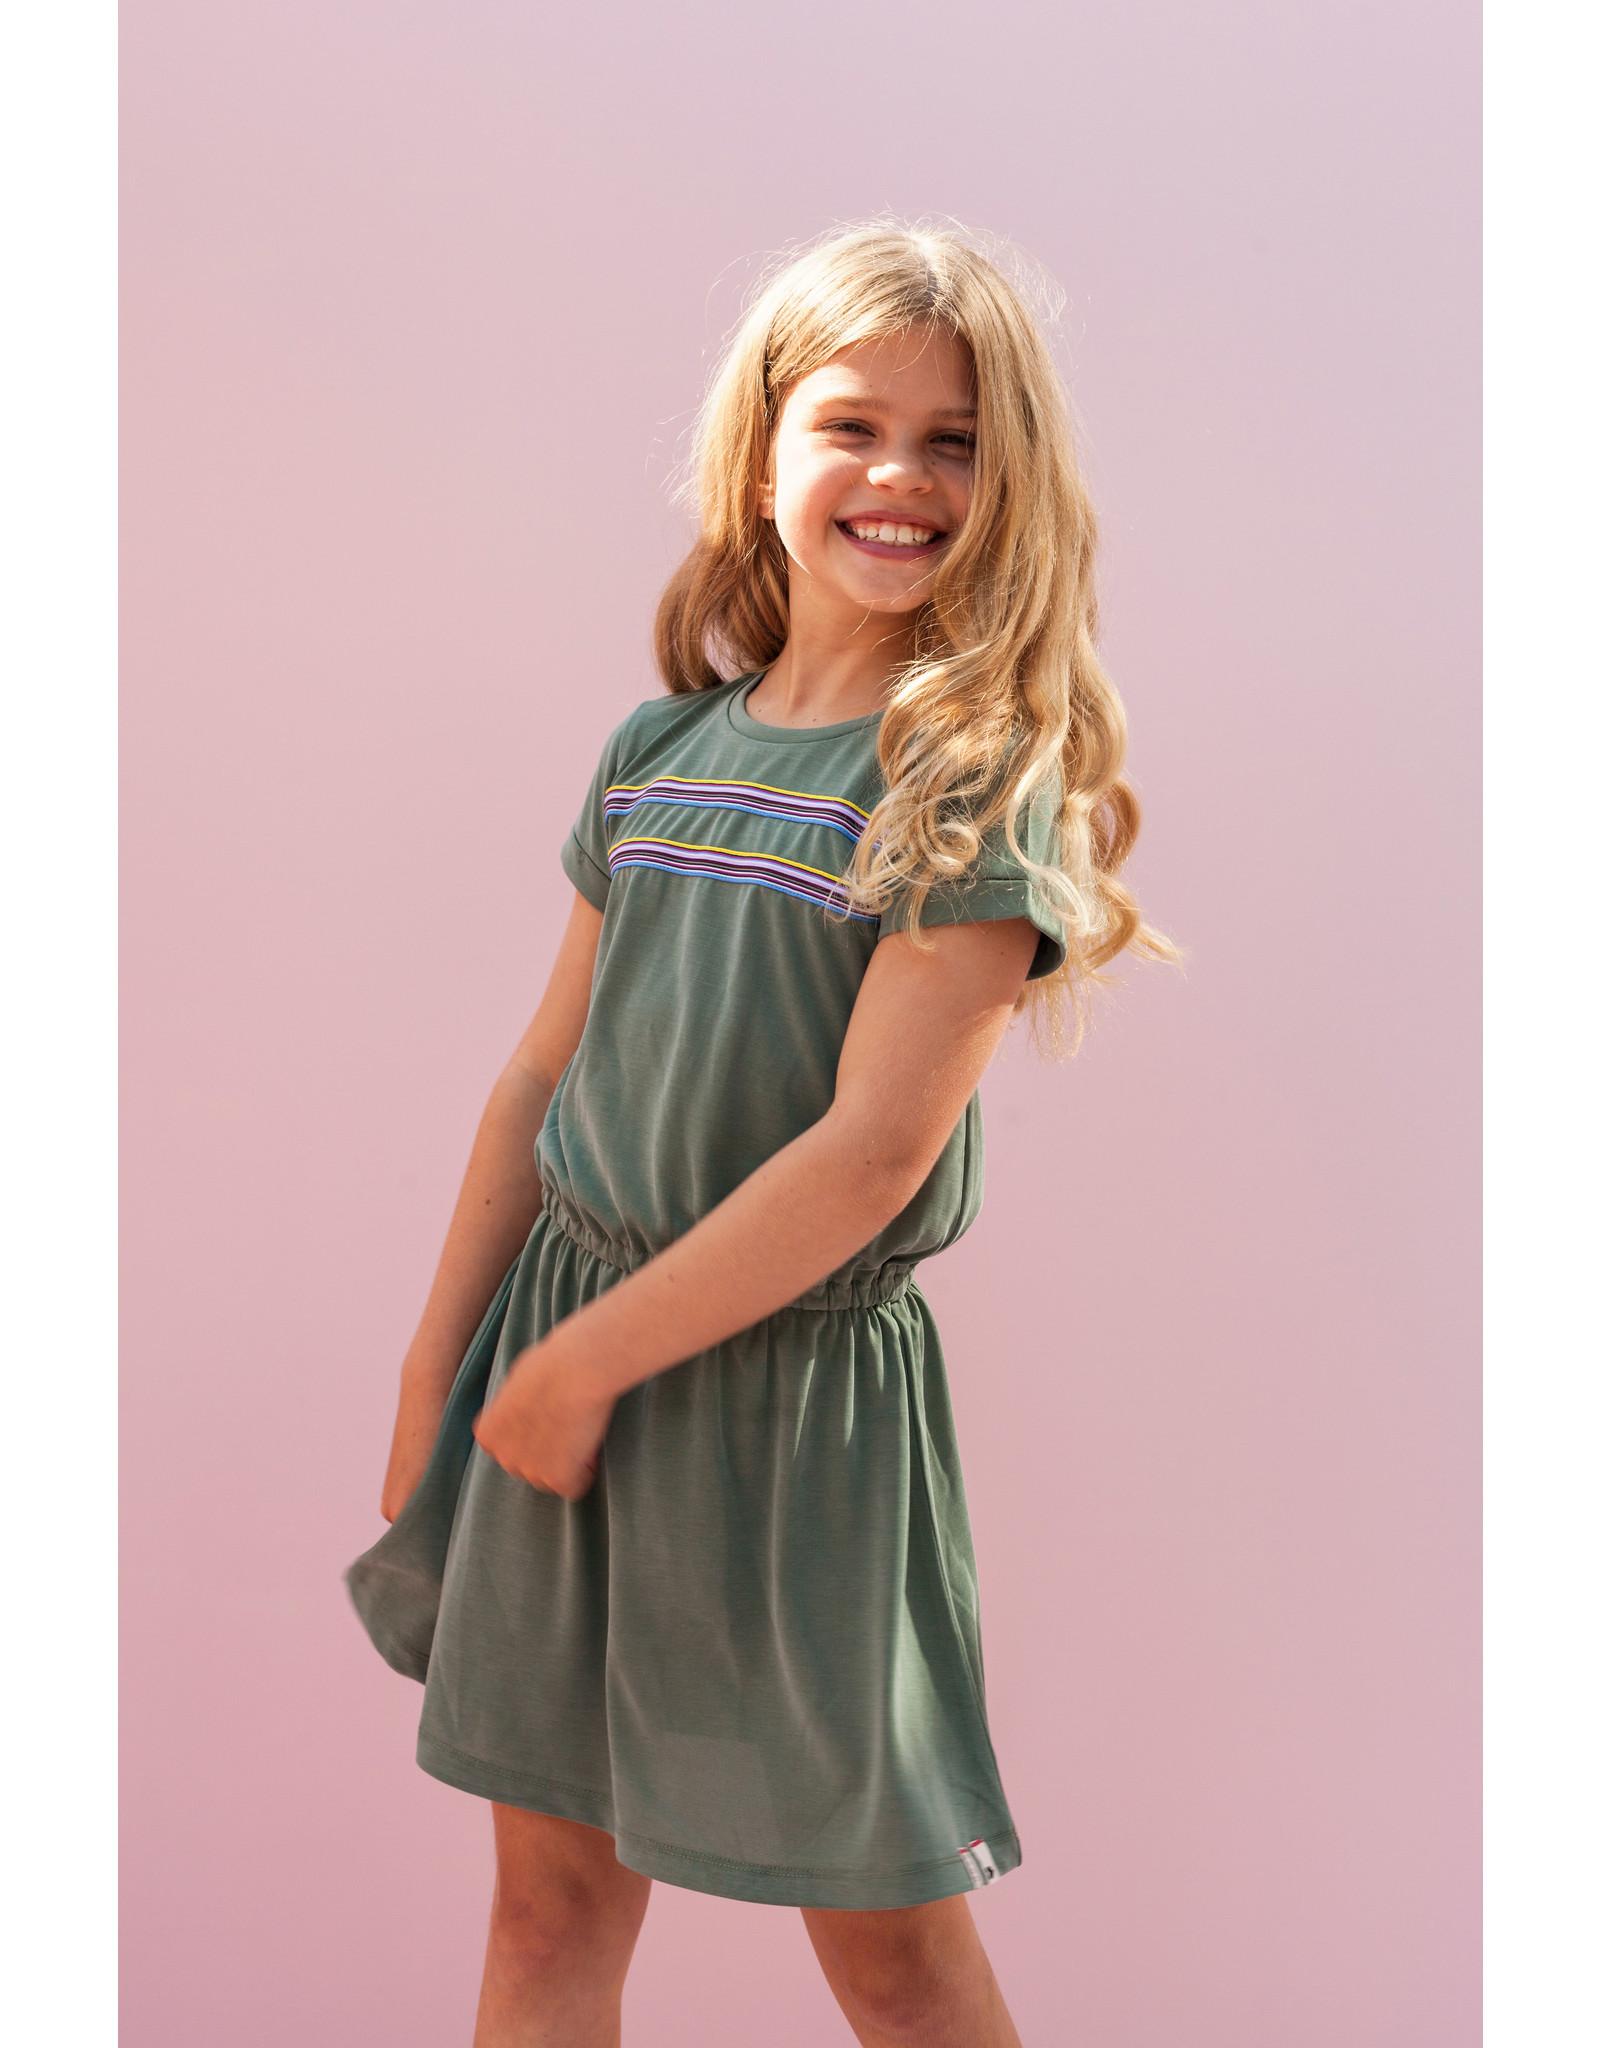 Looxs Revolution Girls dress laurel